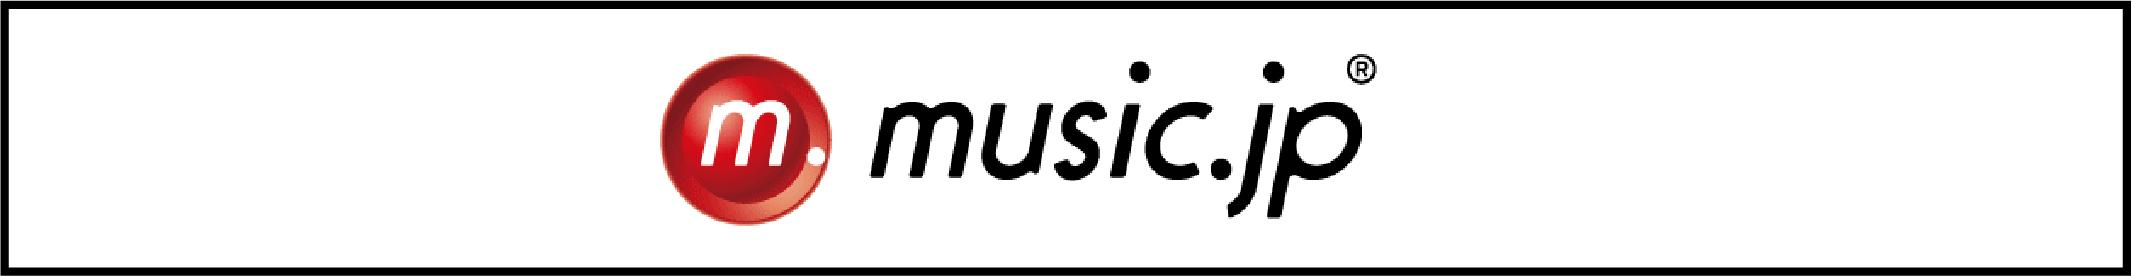 music_jp